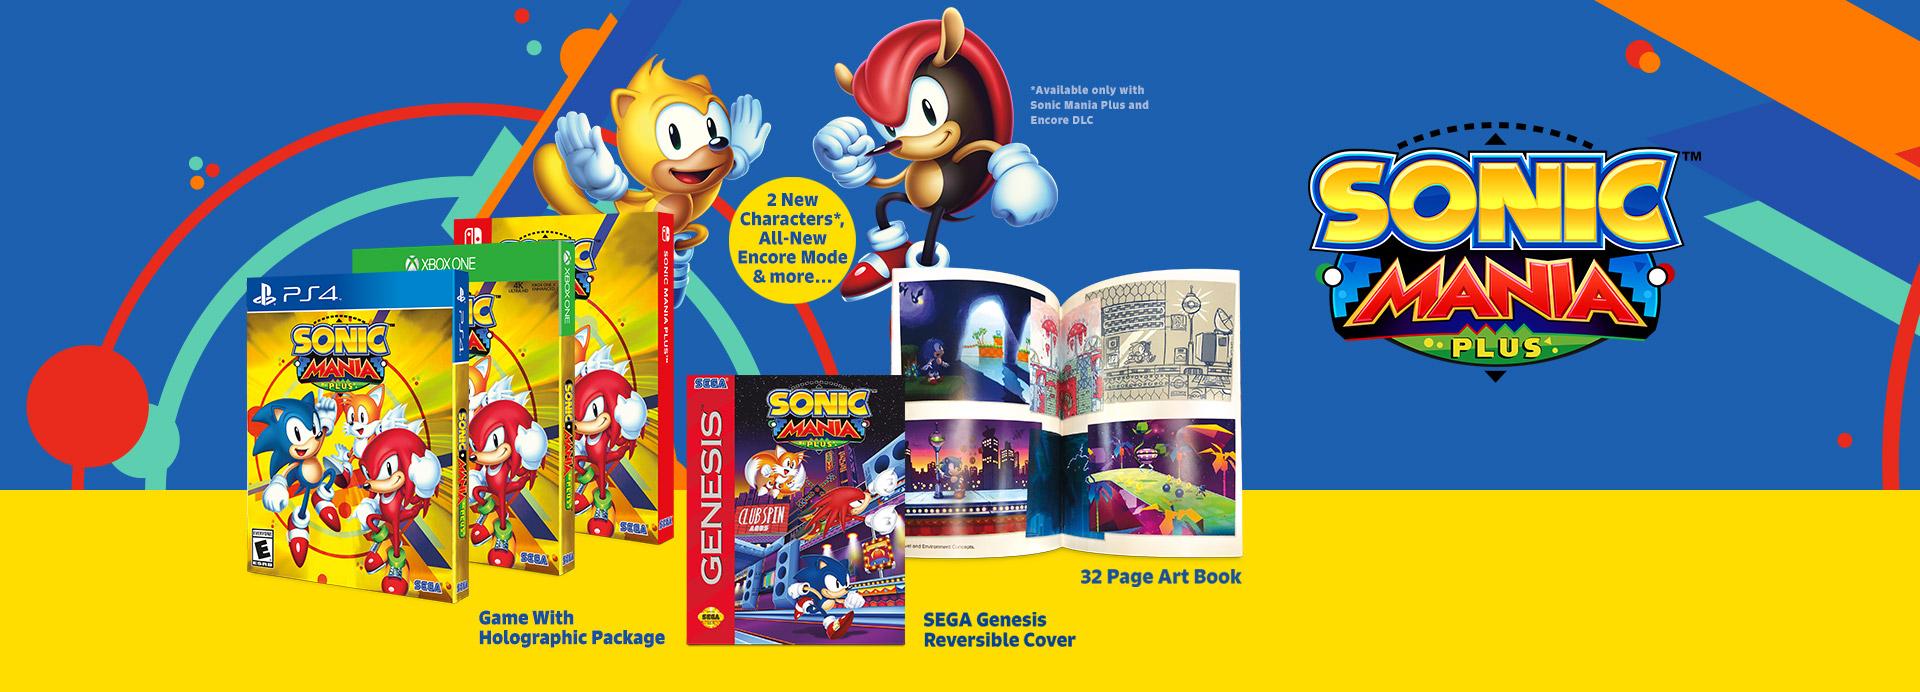 Xbox One Sonic The Hedgehog